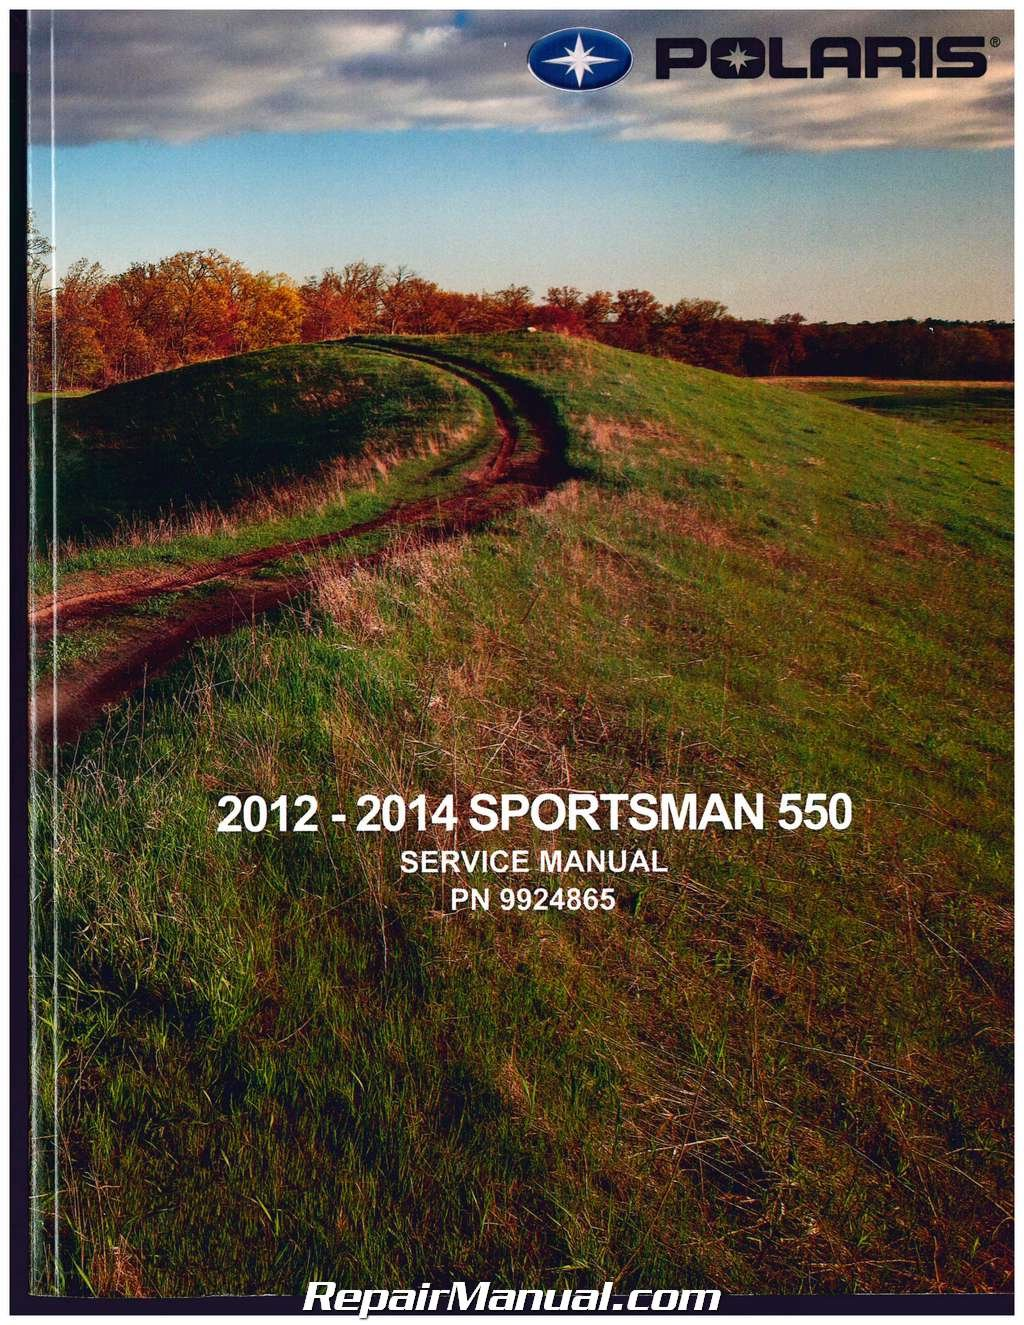 9924865 2012 ? 2014 Polaris Sportsman 550 ATV Service Manual: Manufacturer:  Amazon.com: Books